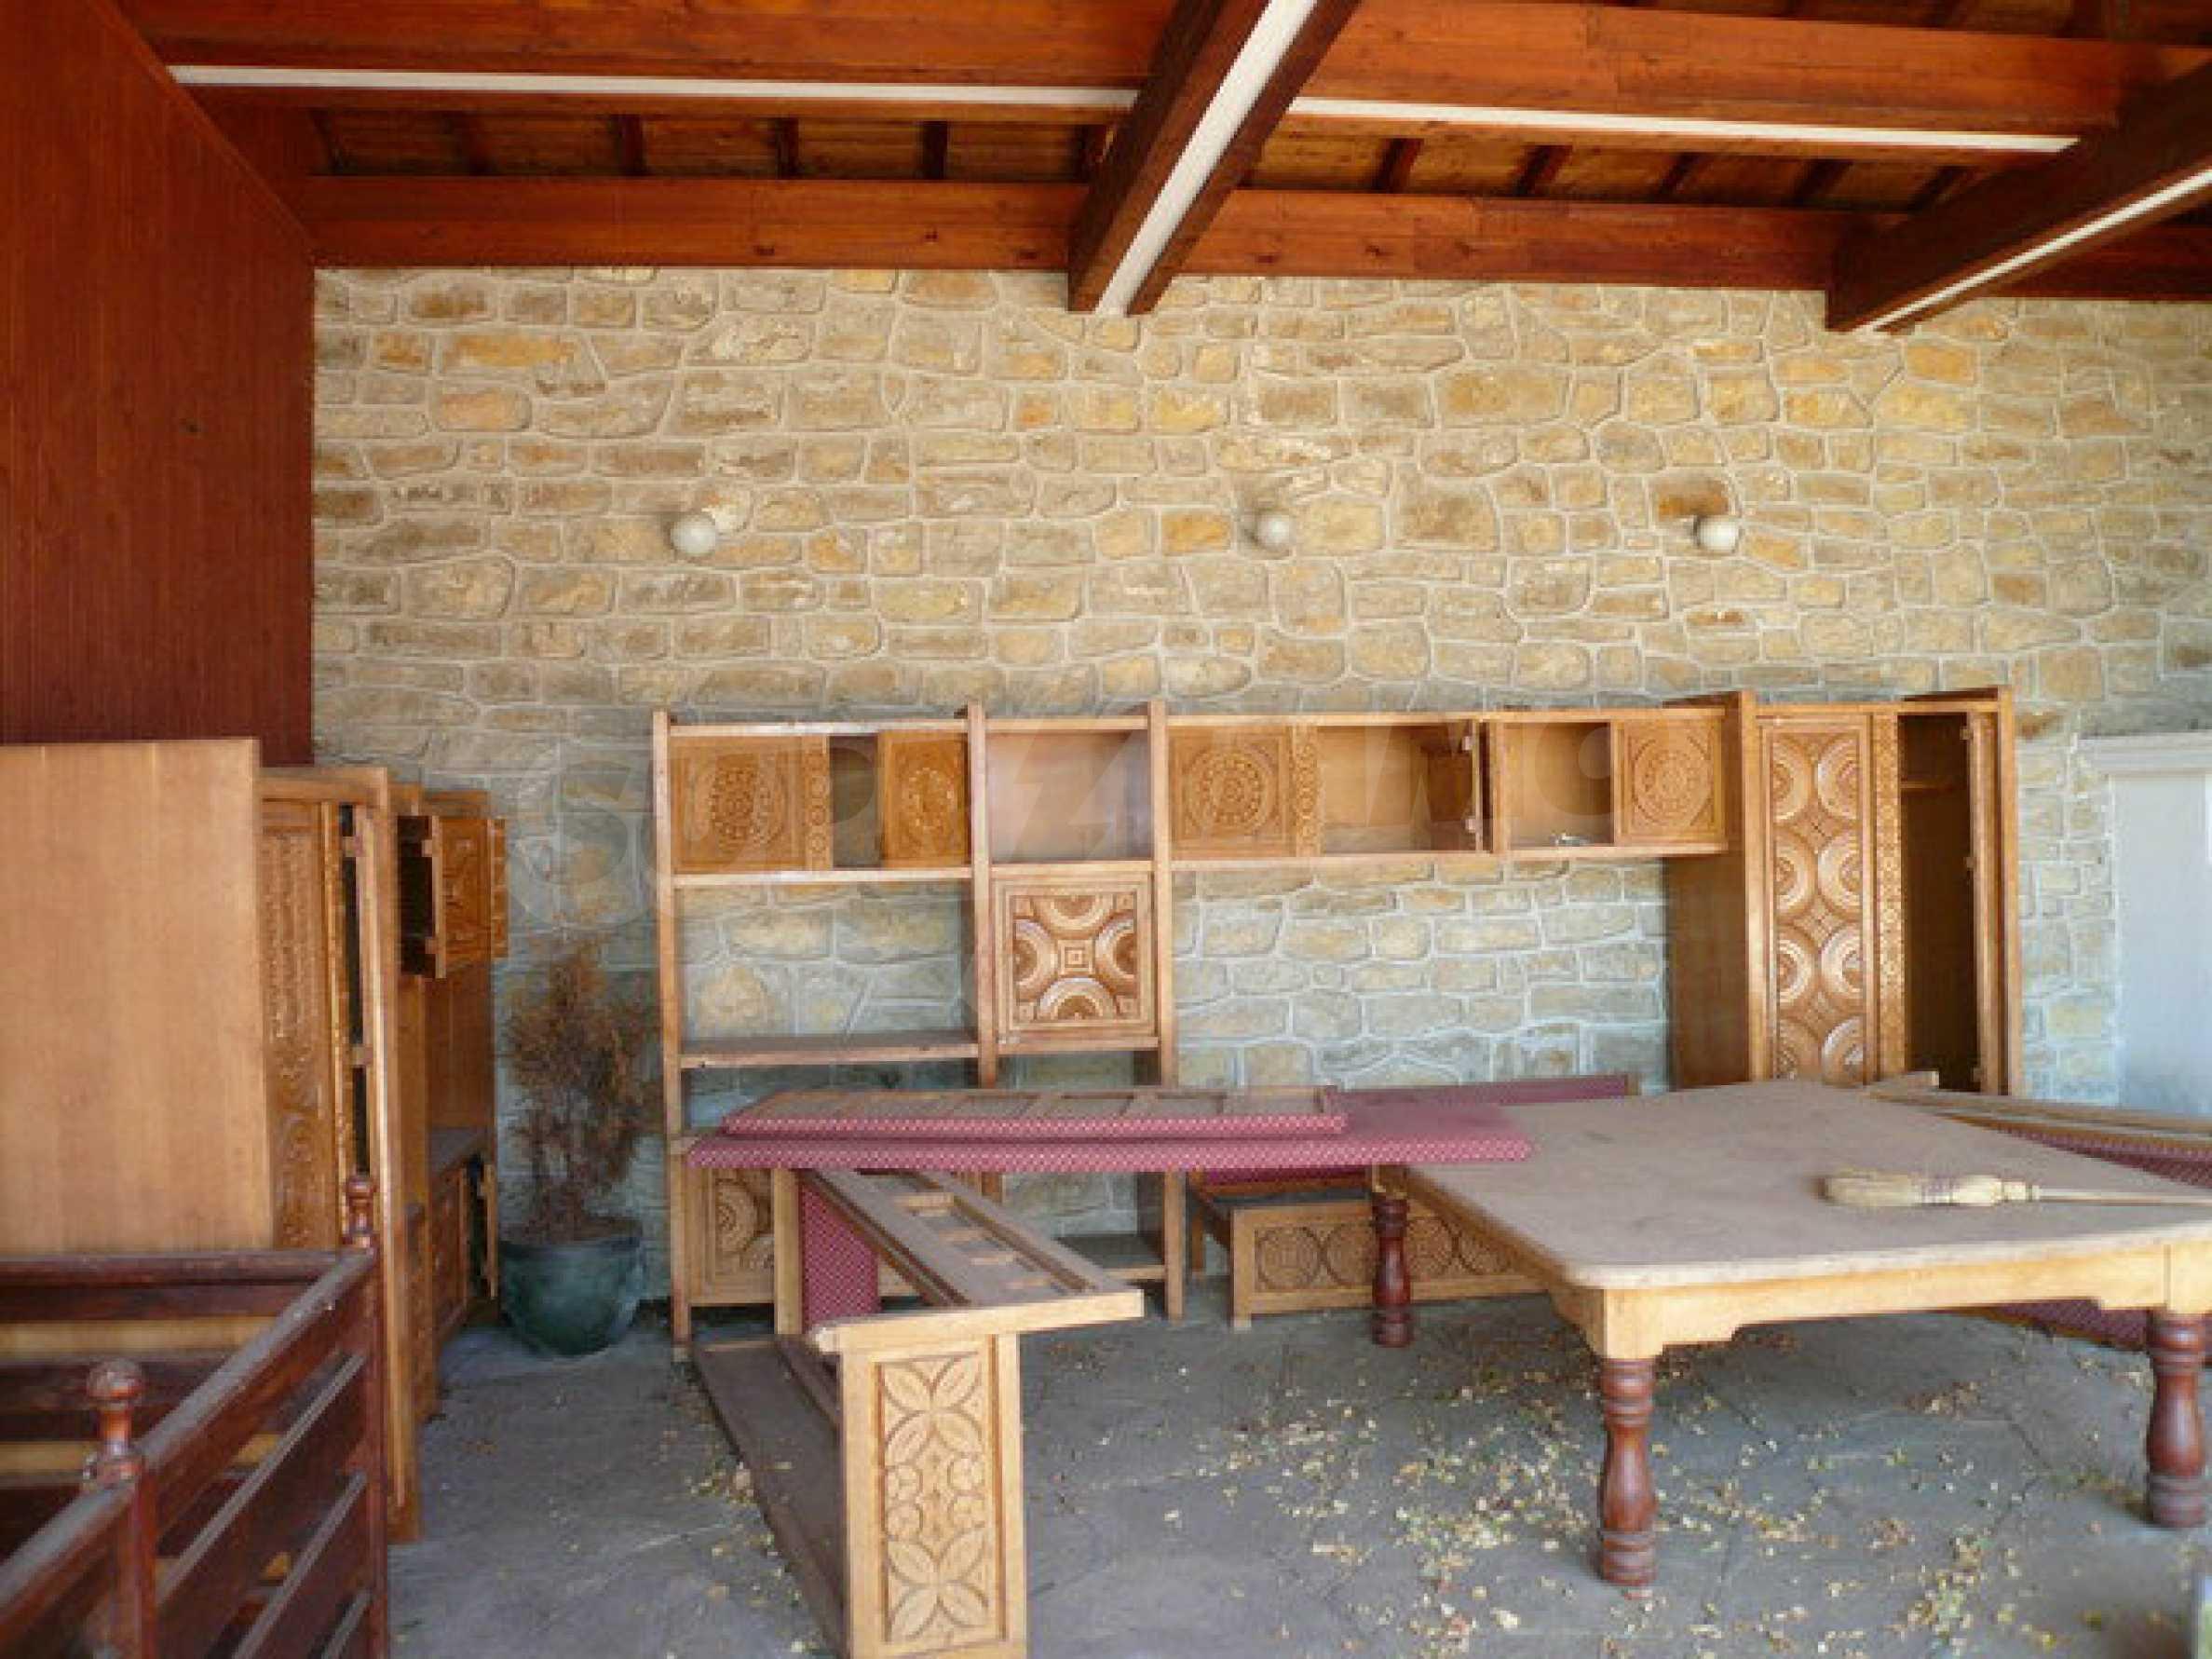 Renoviertes Haus nur 3 km von Veliko Tarnovo entfernt 15